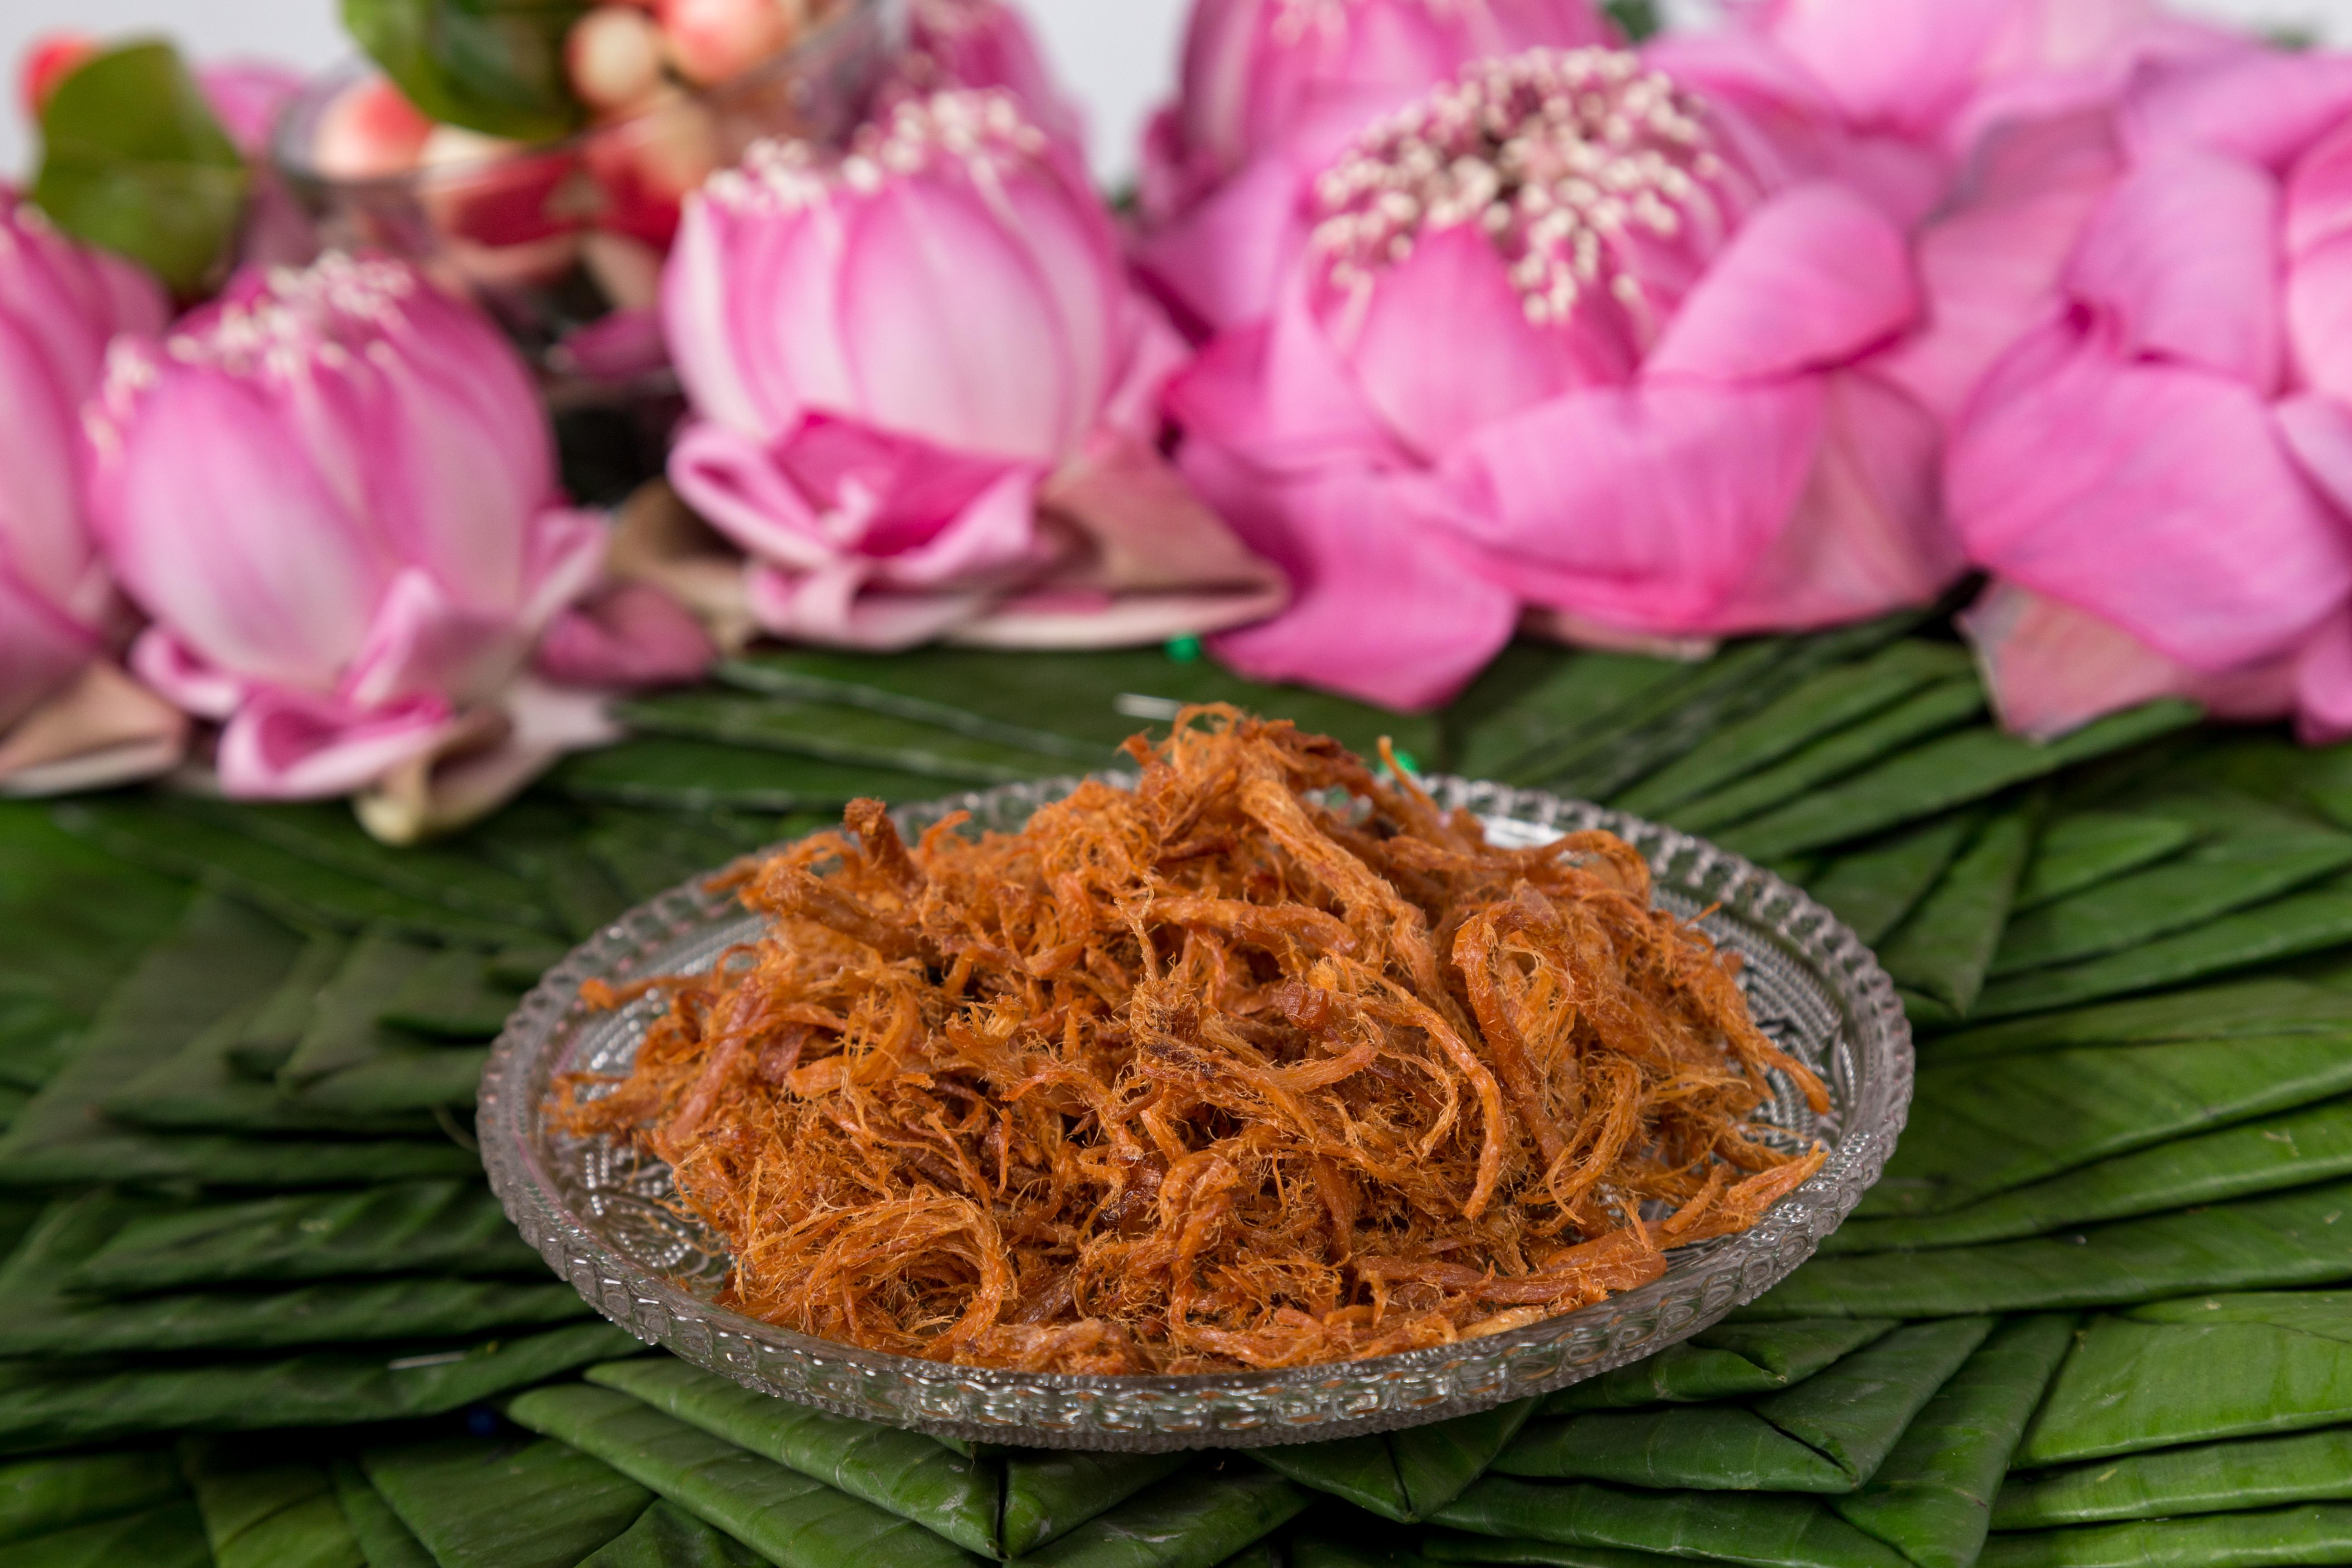 'Tong Kwai' Crispy Meat Floss